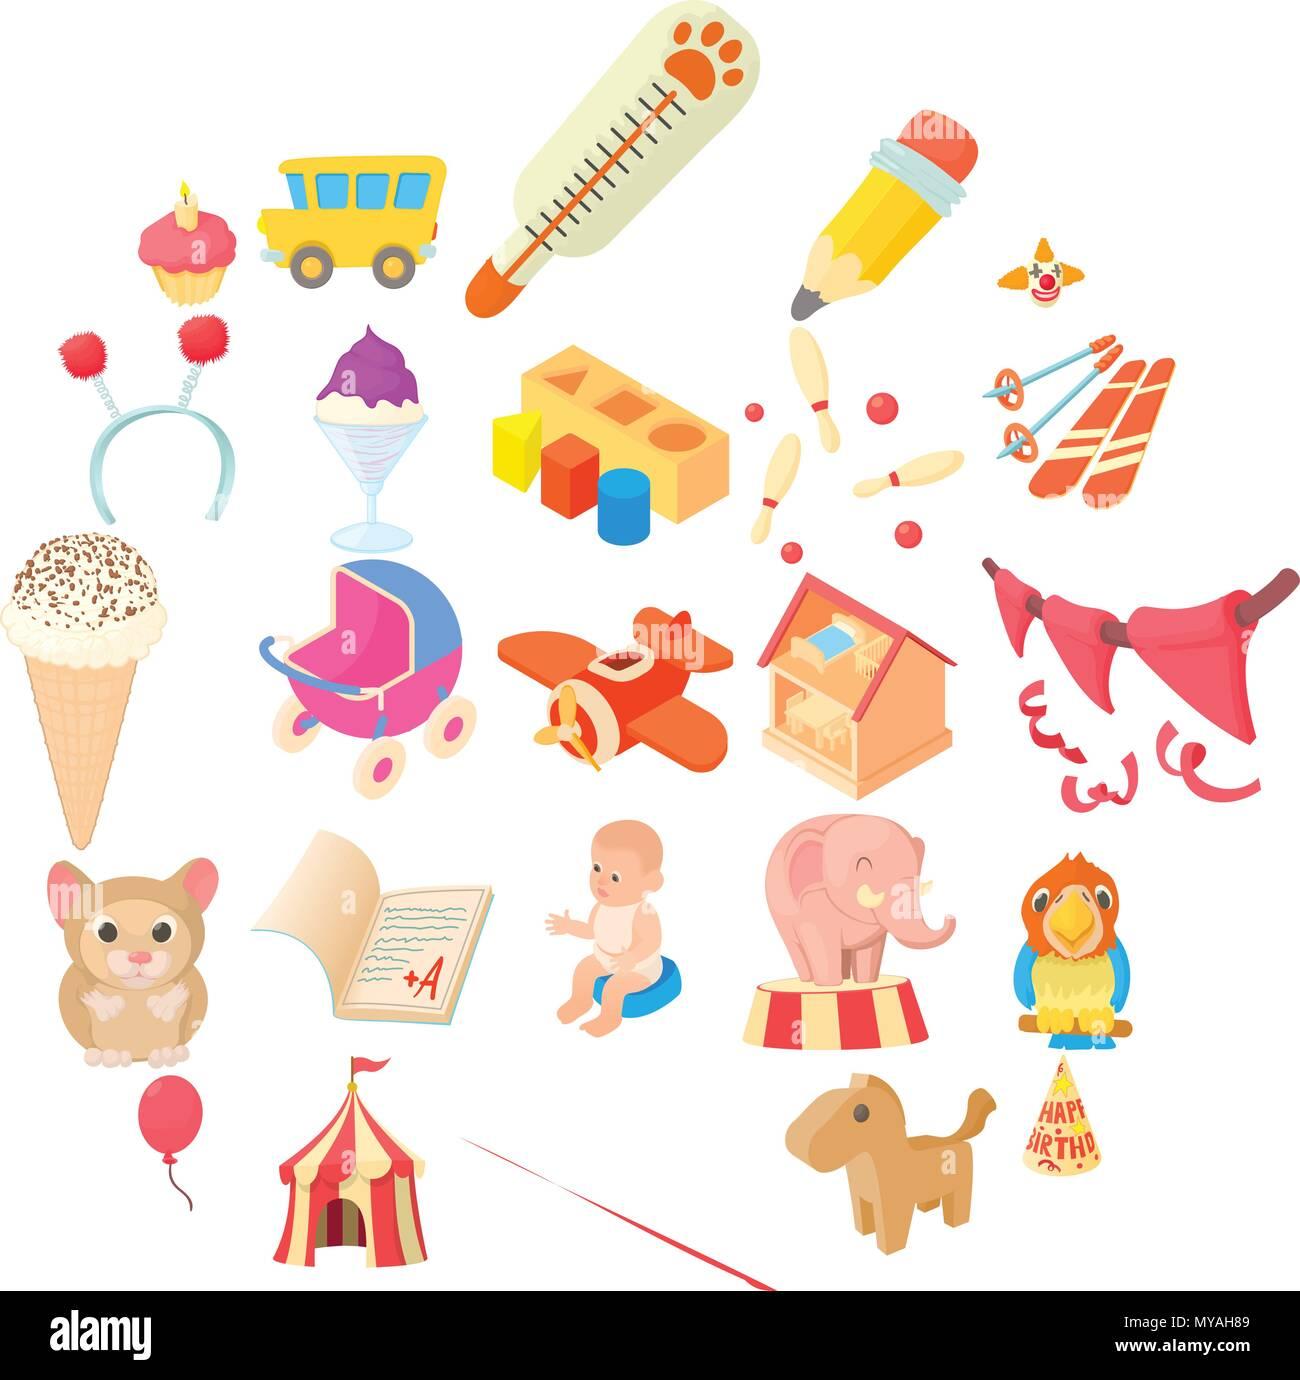 Games for schoolchildren icons set, cartoon style - Stock Vector